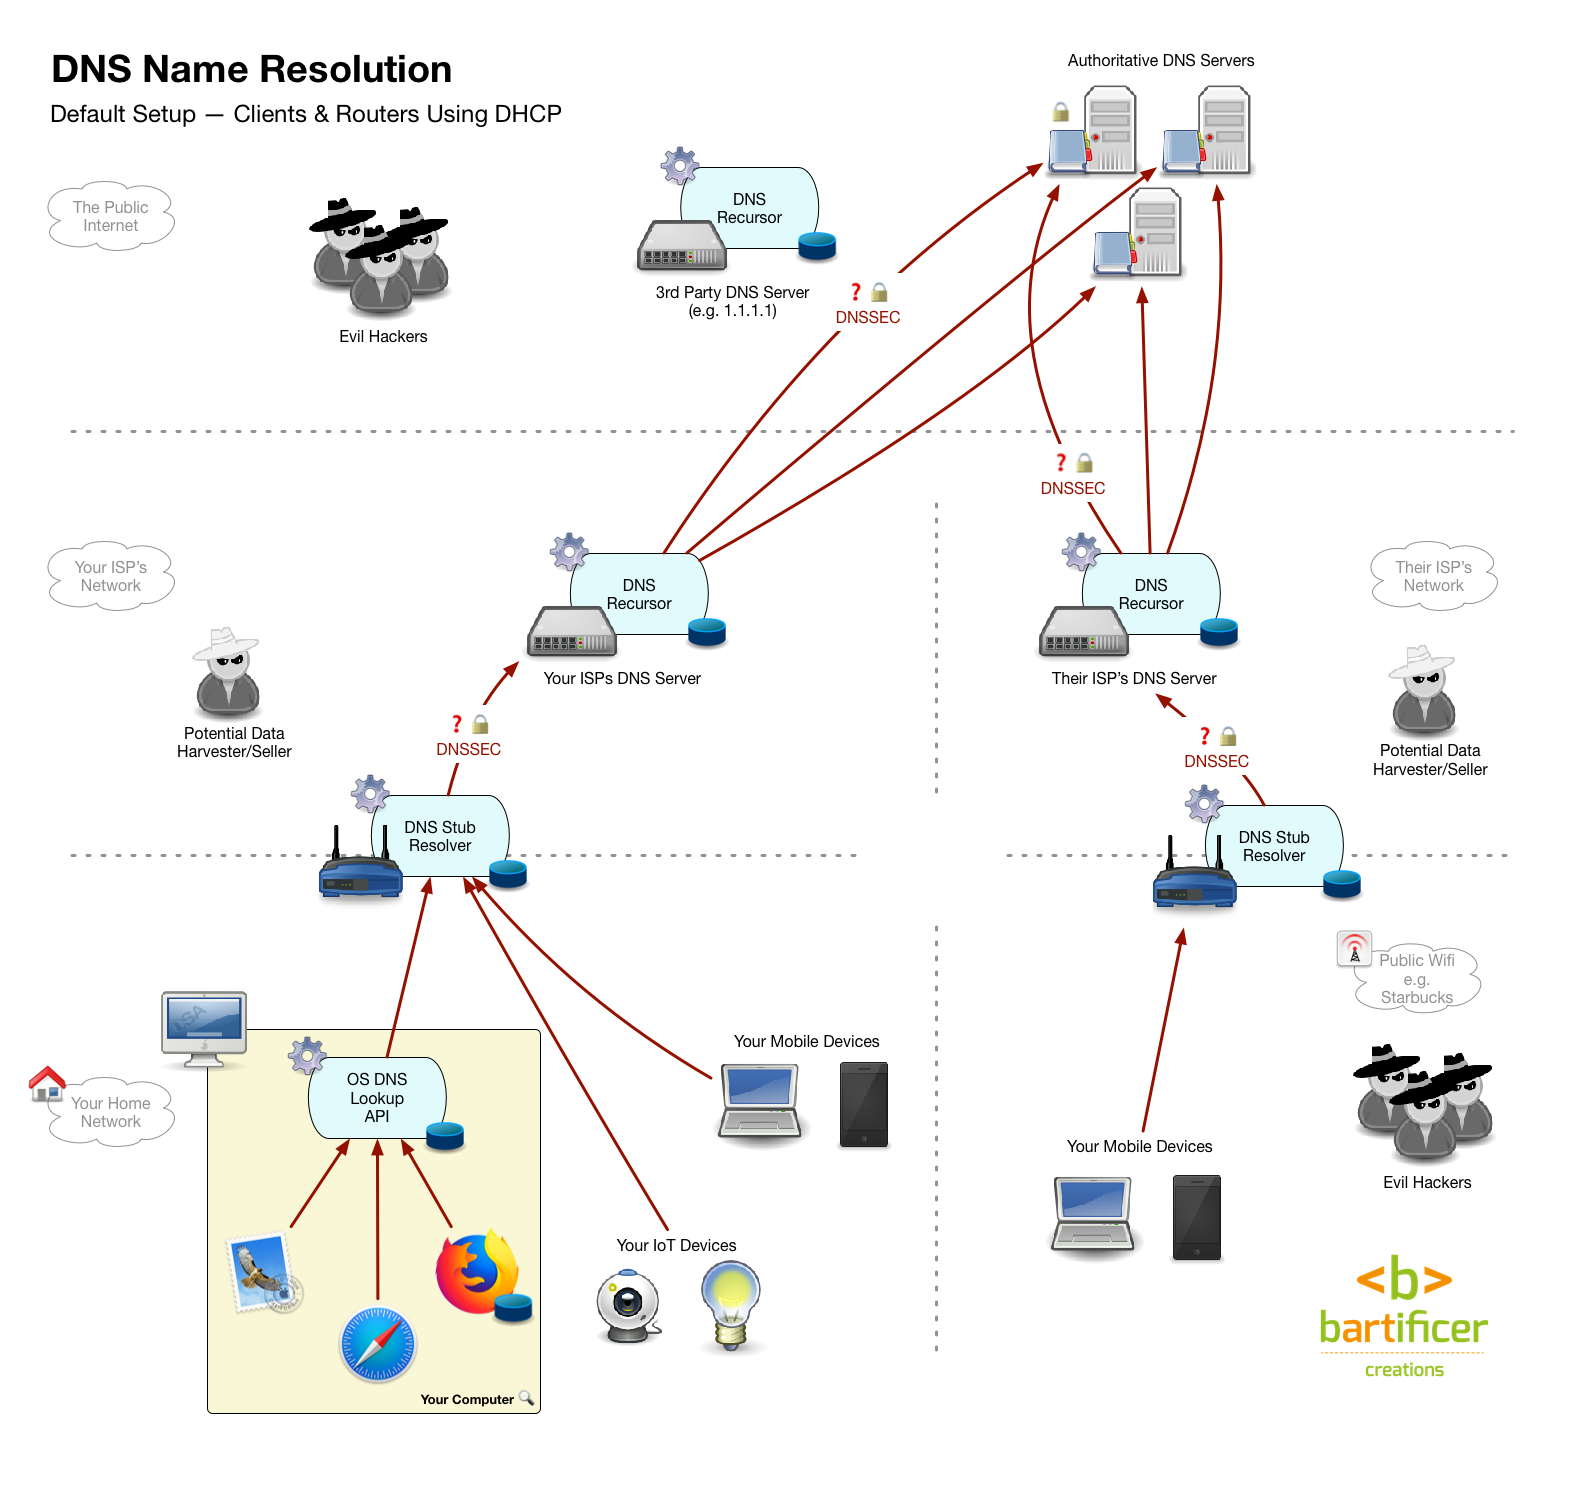 180412 DNS 1 Default